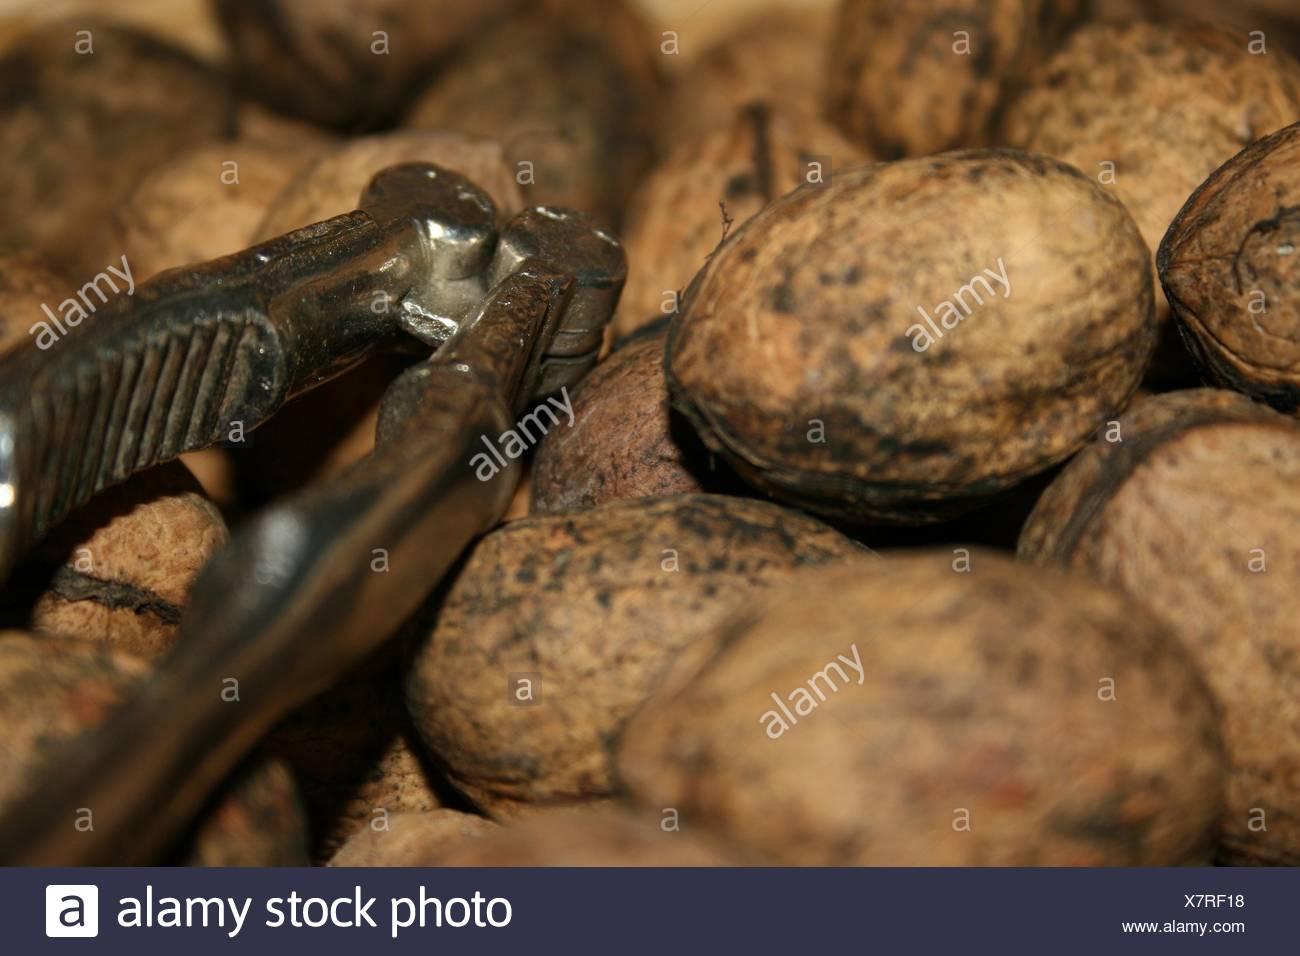 walnuts - Stock Image